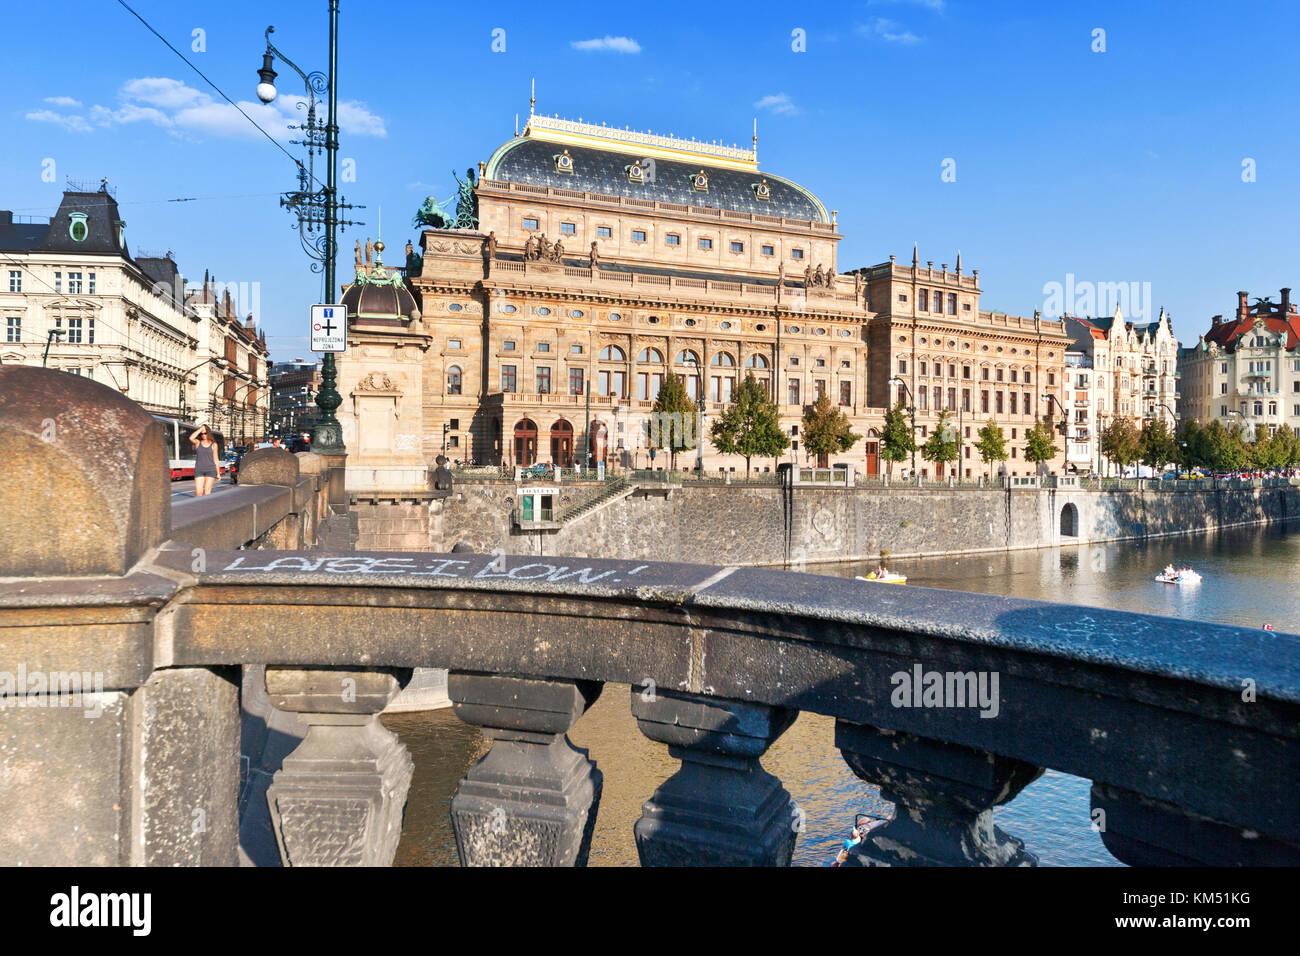 neo-renaissance National theater, Moldau river Old Town (UNESCO), Prague, Czech Republic - Stock Image